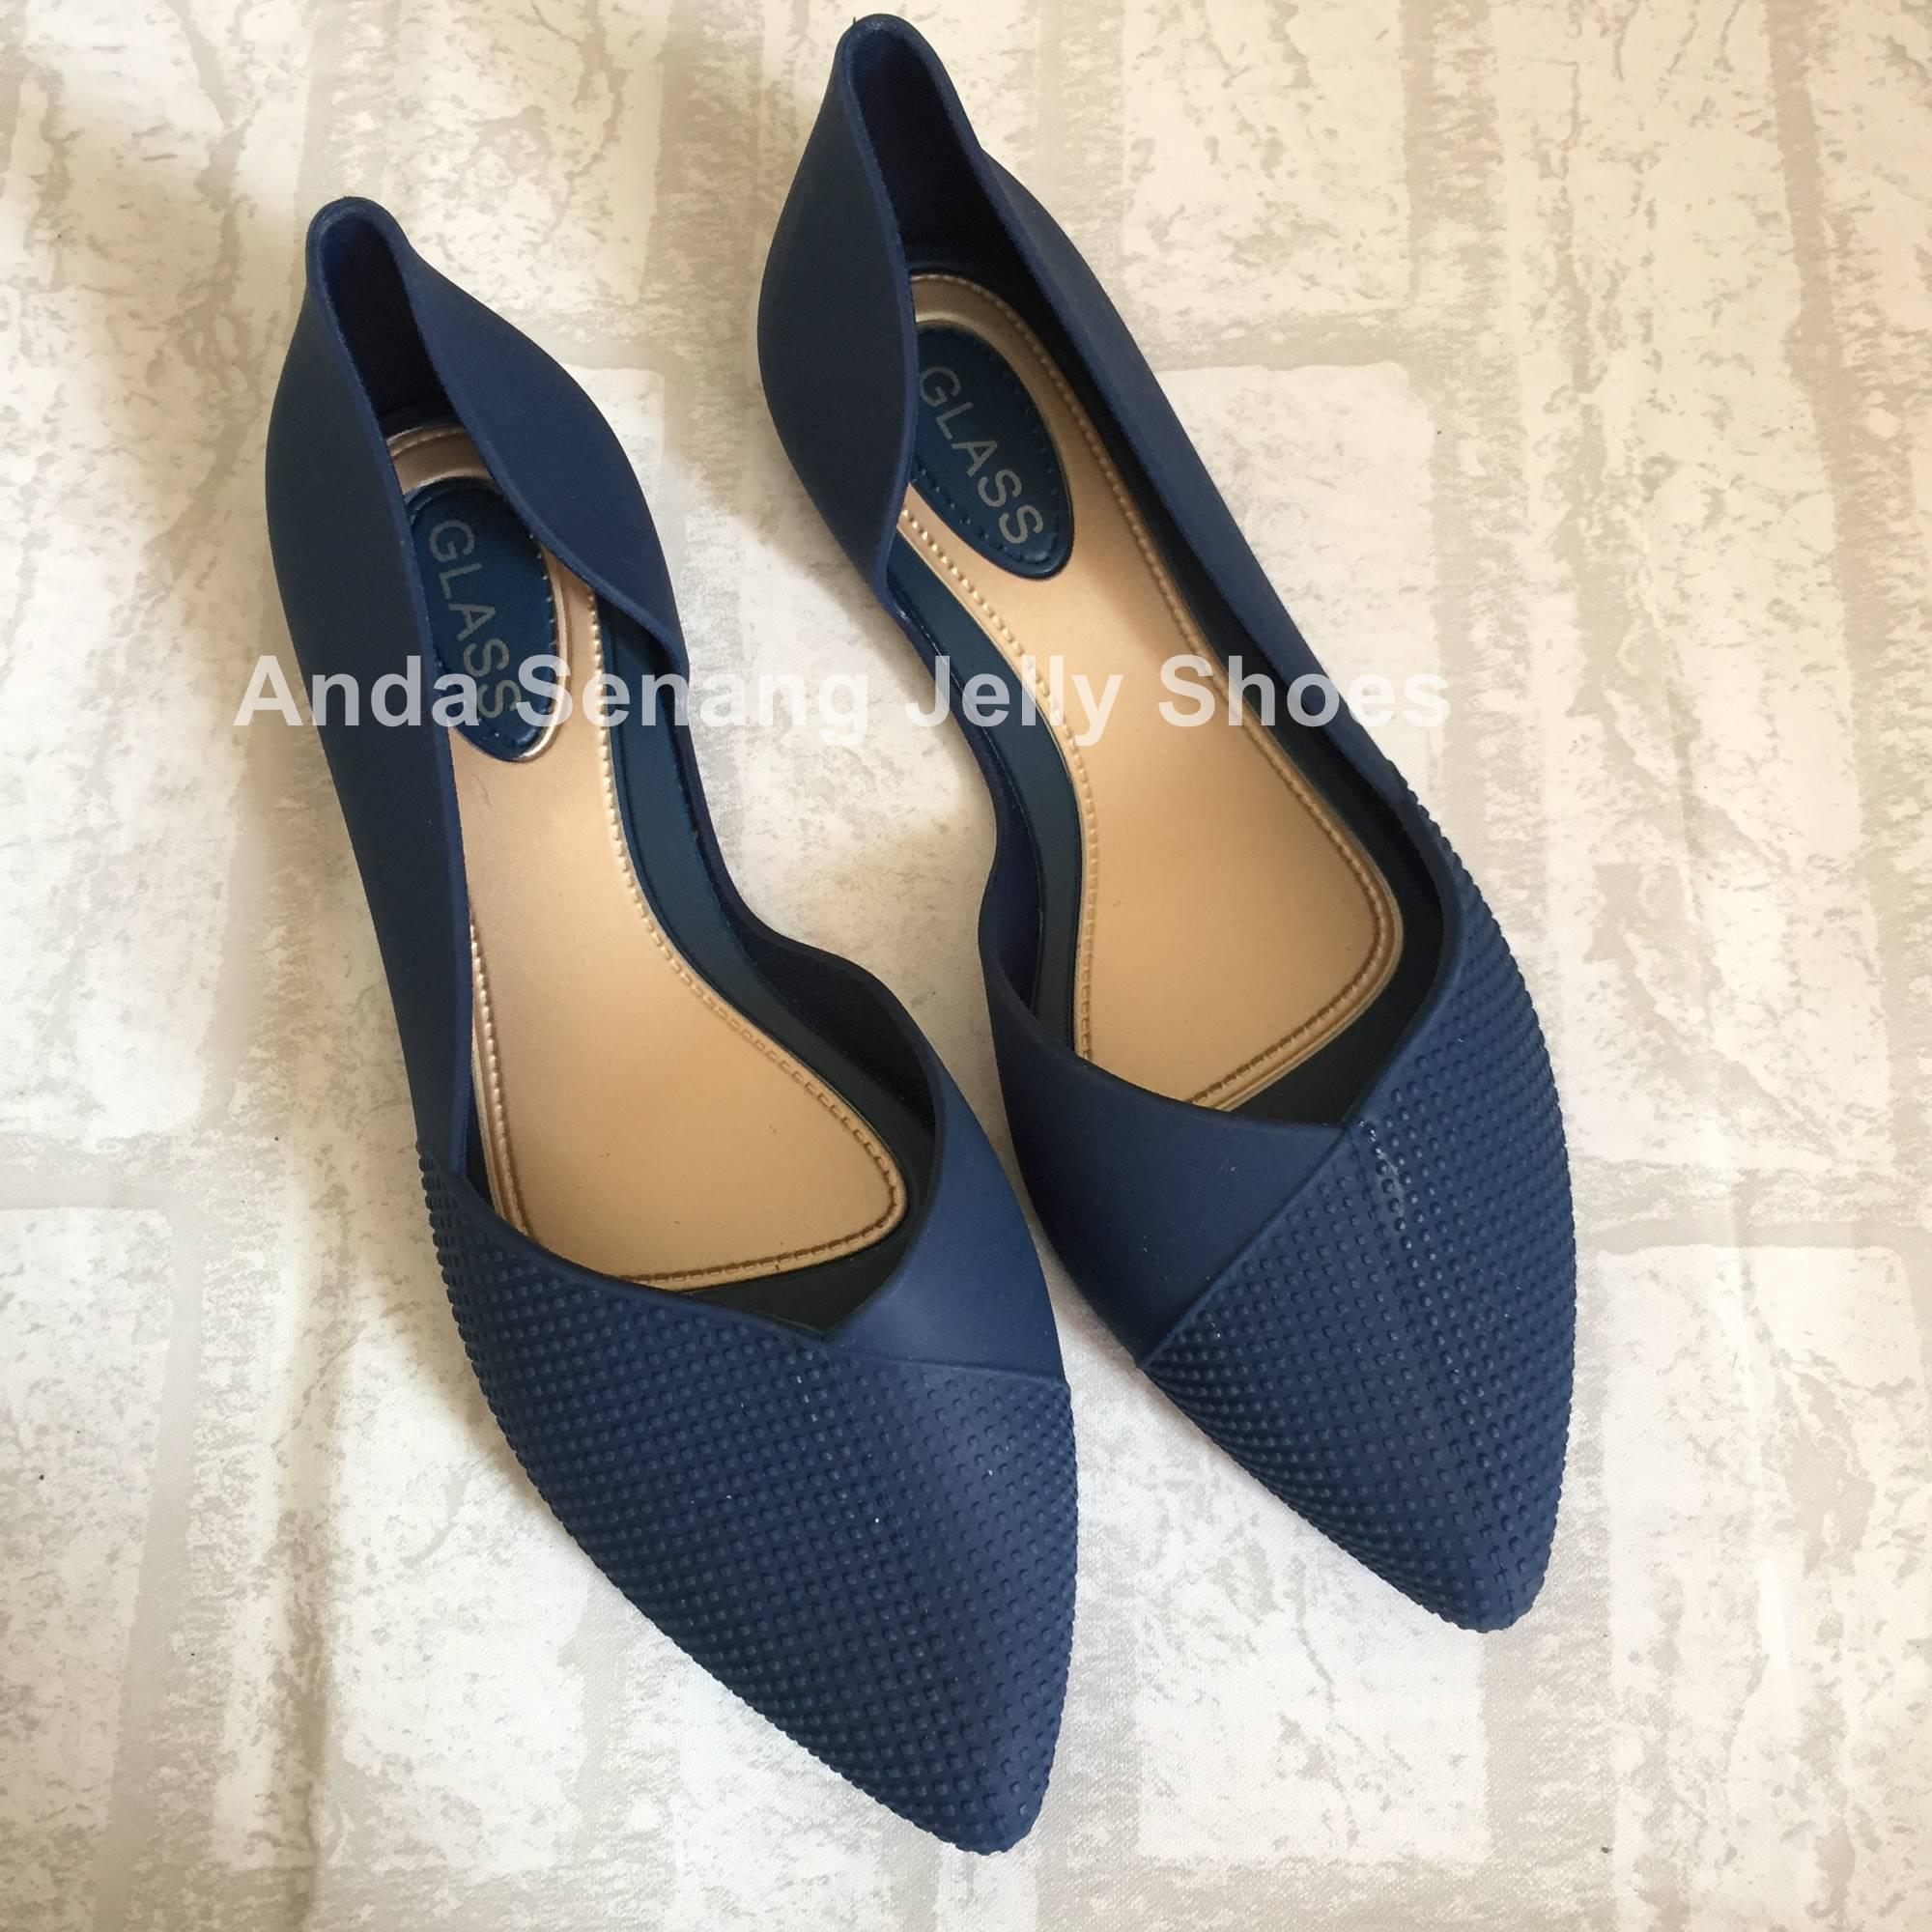 Buy Sell Cheapest Jelly Shoes Lancip Best Quality Product Deals Yumeida Sepatu Kerja Termurah Wanita Flat